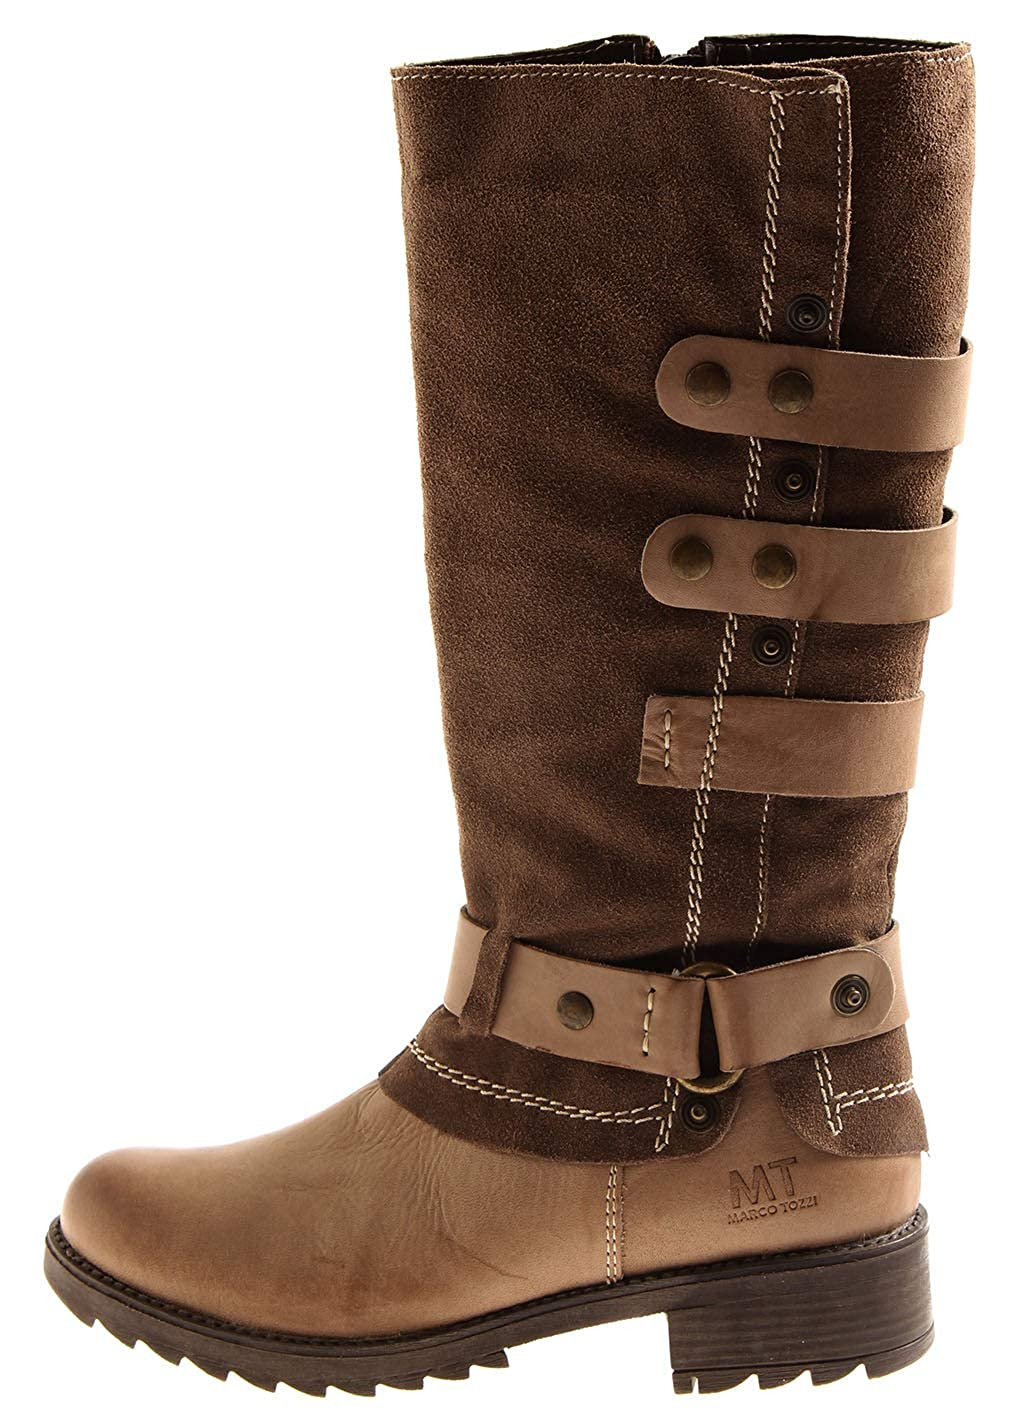 Schuhe & Handtaschen MARCO TOZZI 2 25635 Damen Winterstiefel